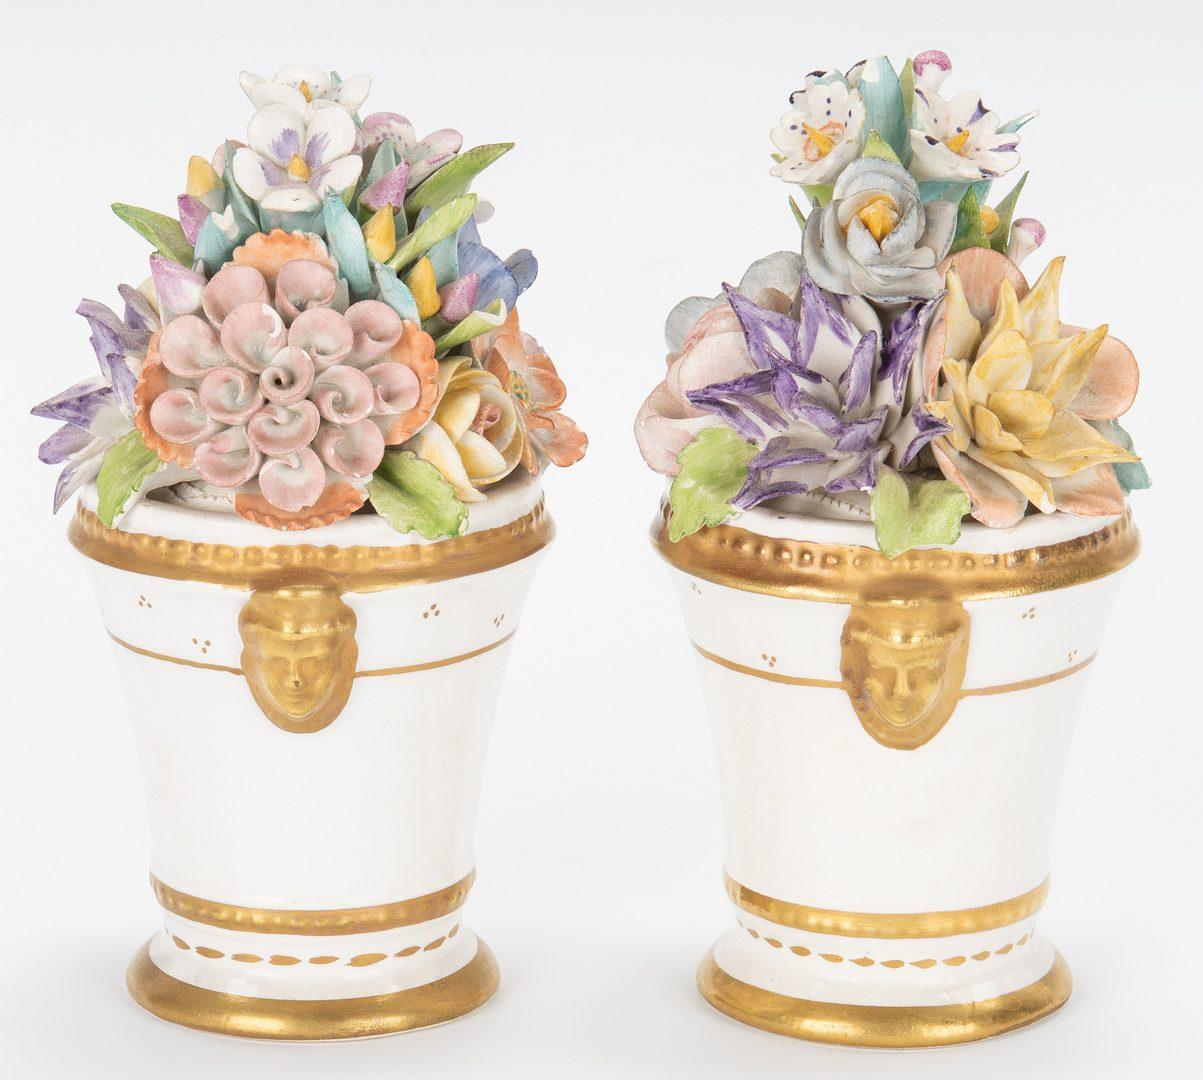 Lot 327: Group of 6 European Porcelain Items